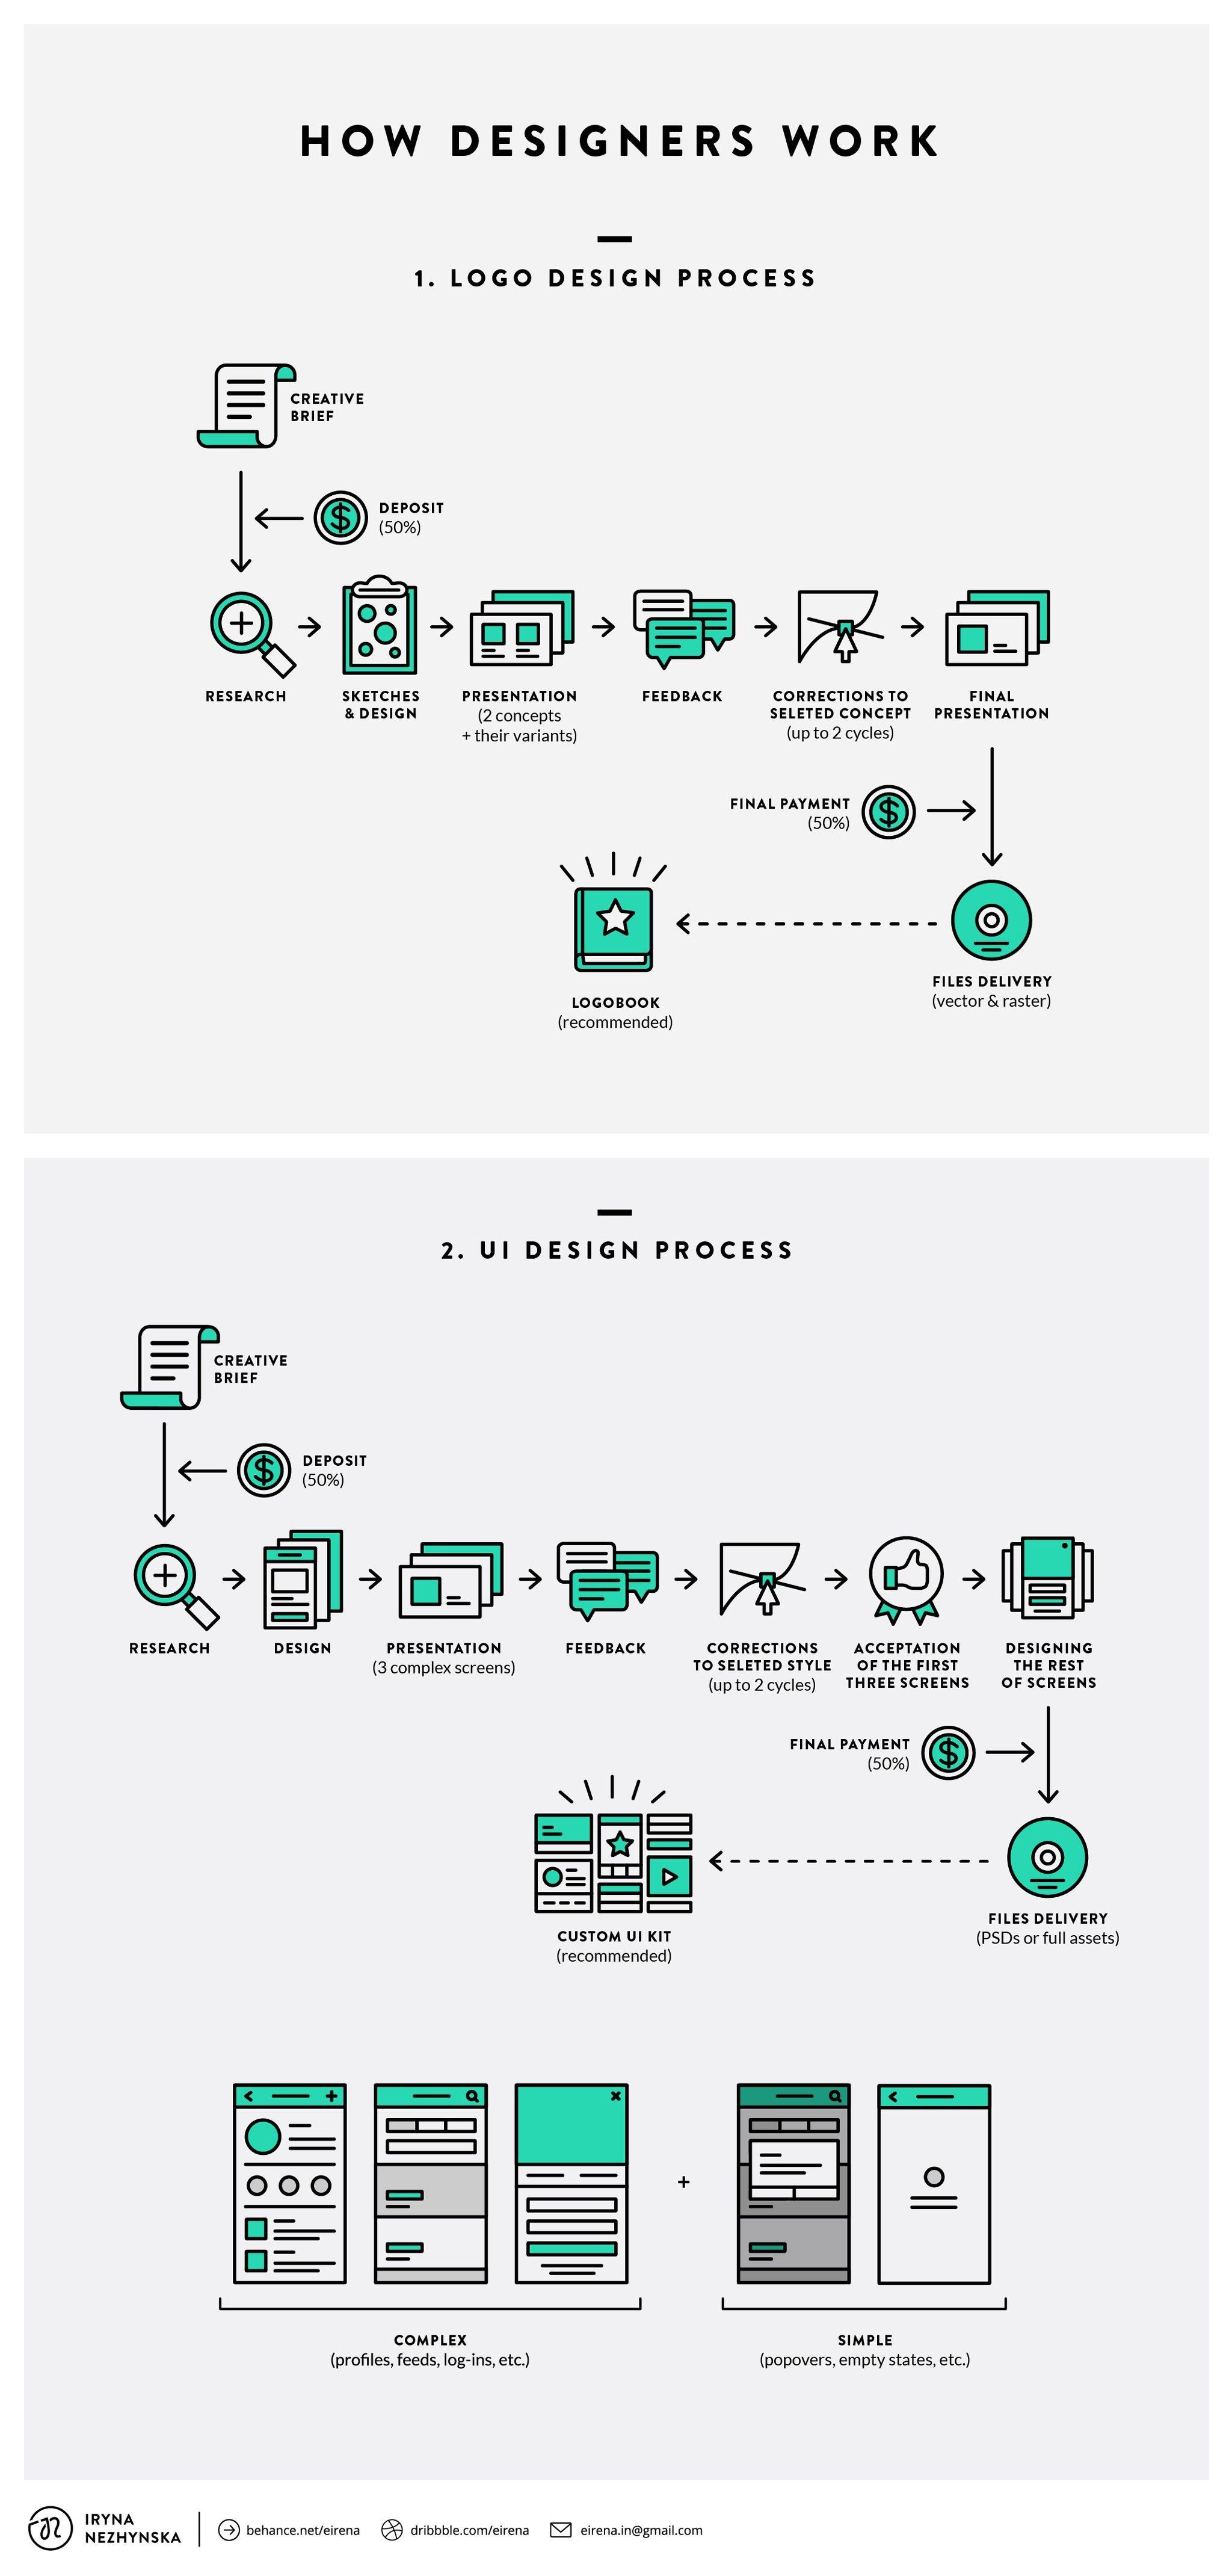 Engineering Design Process Diagram Interaction Design Recursos Interessantes Of Engineering Design Process Diagram